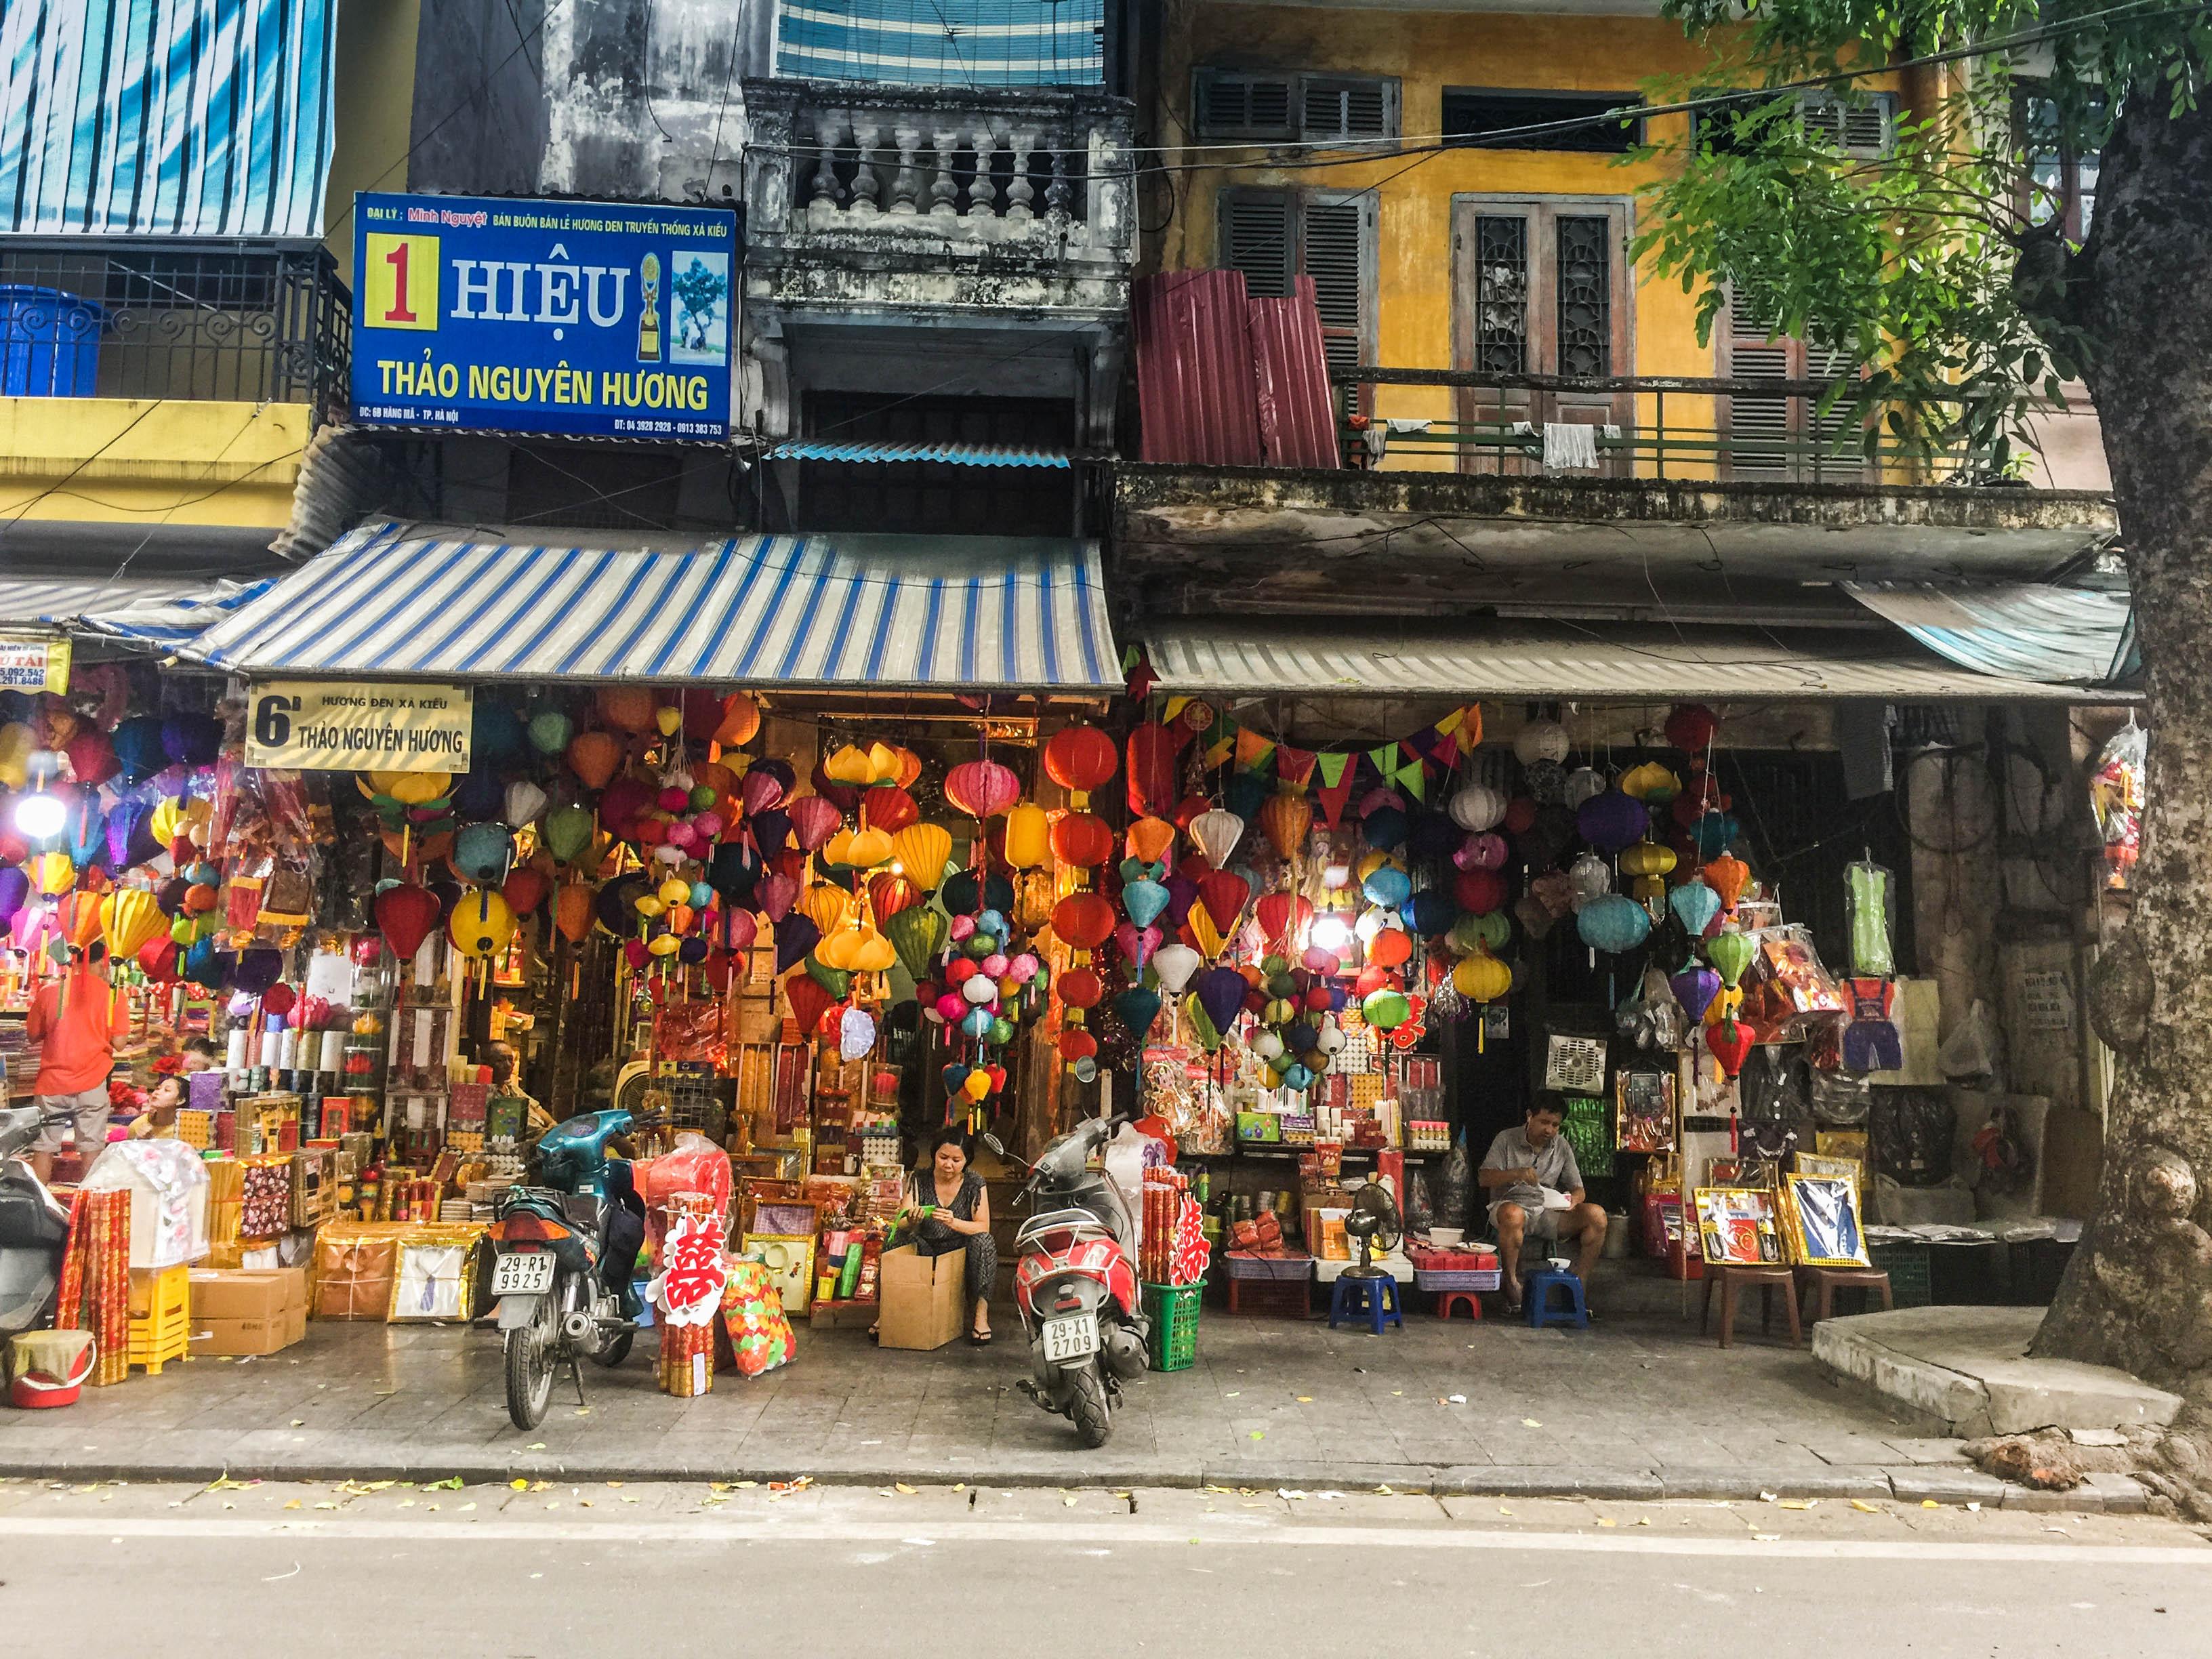 an image of Vietnamese street food